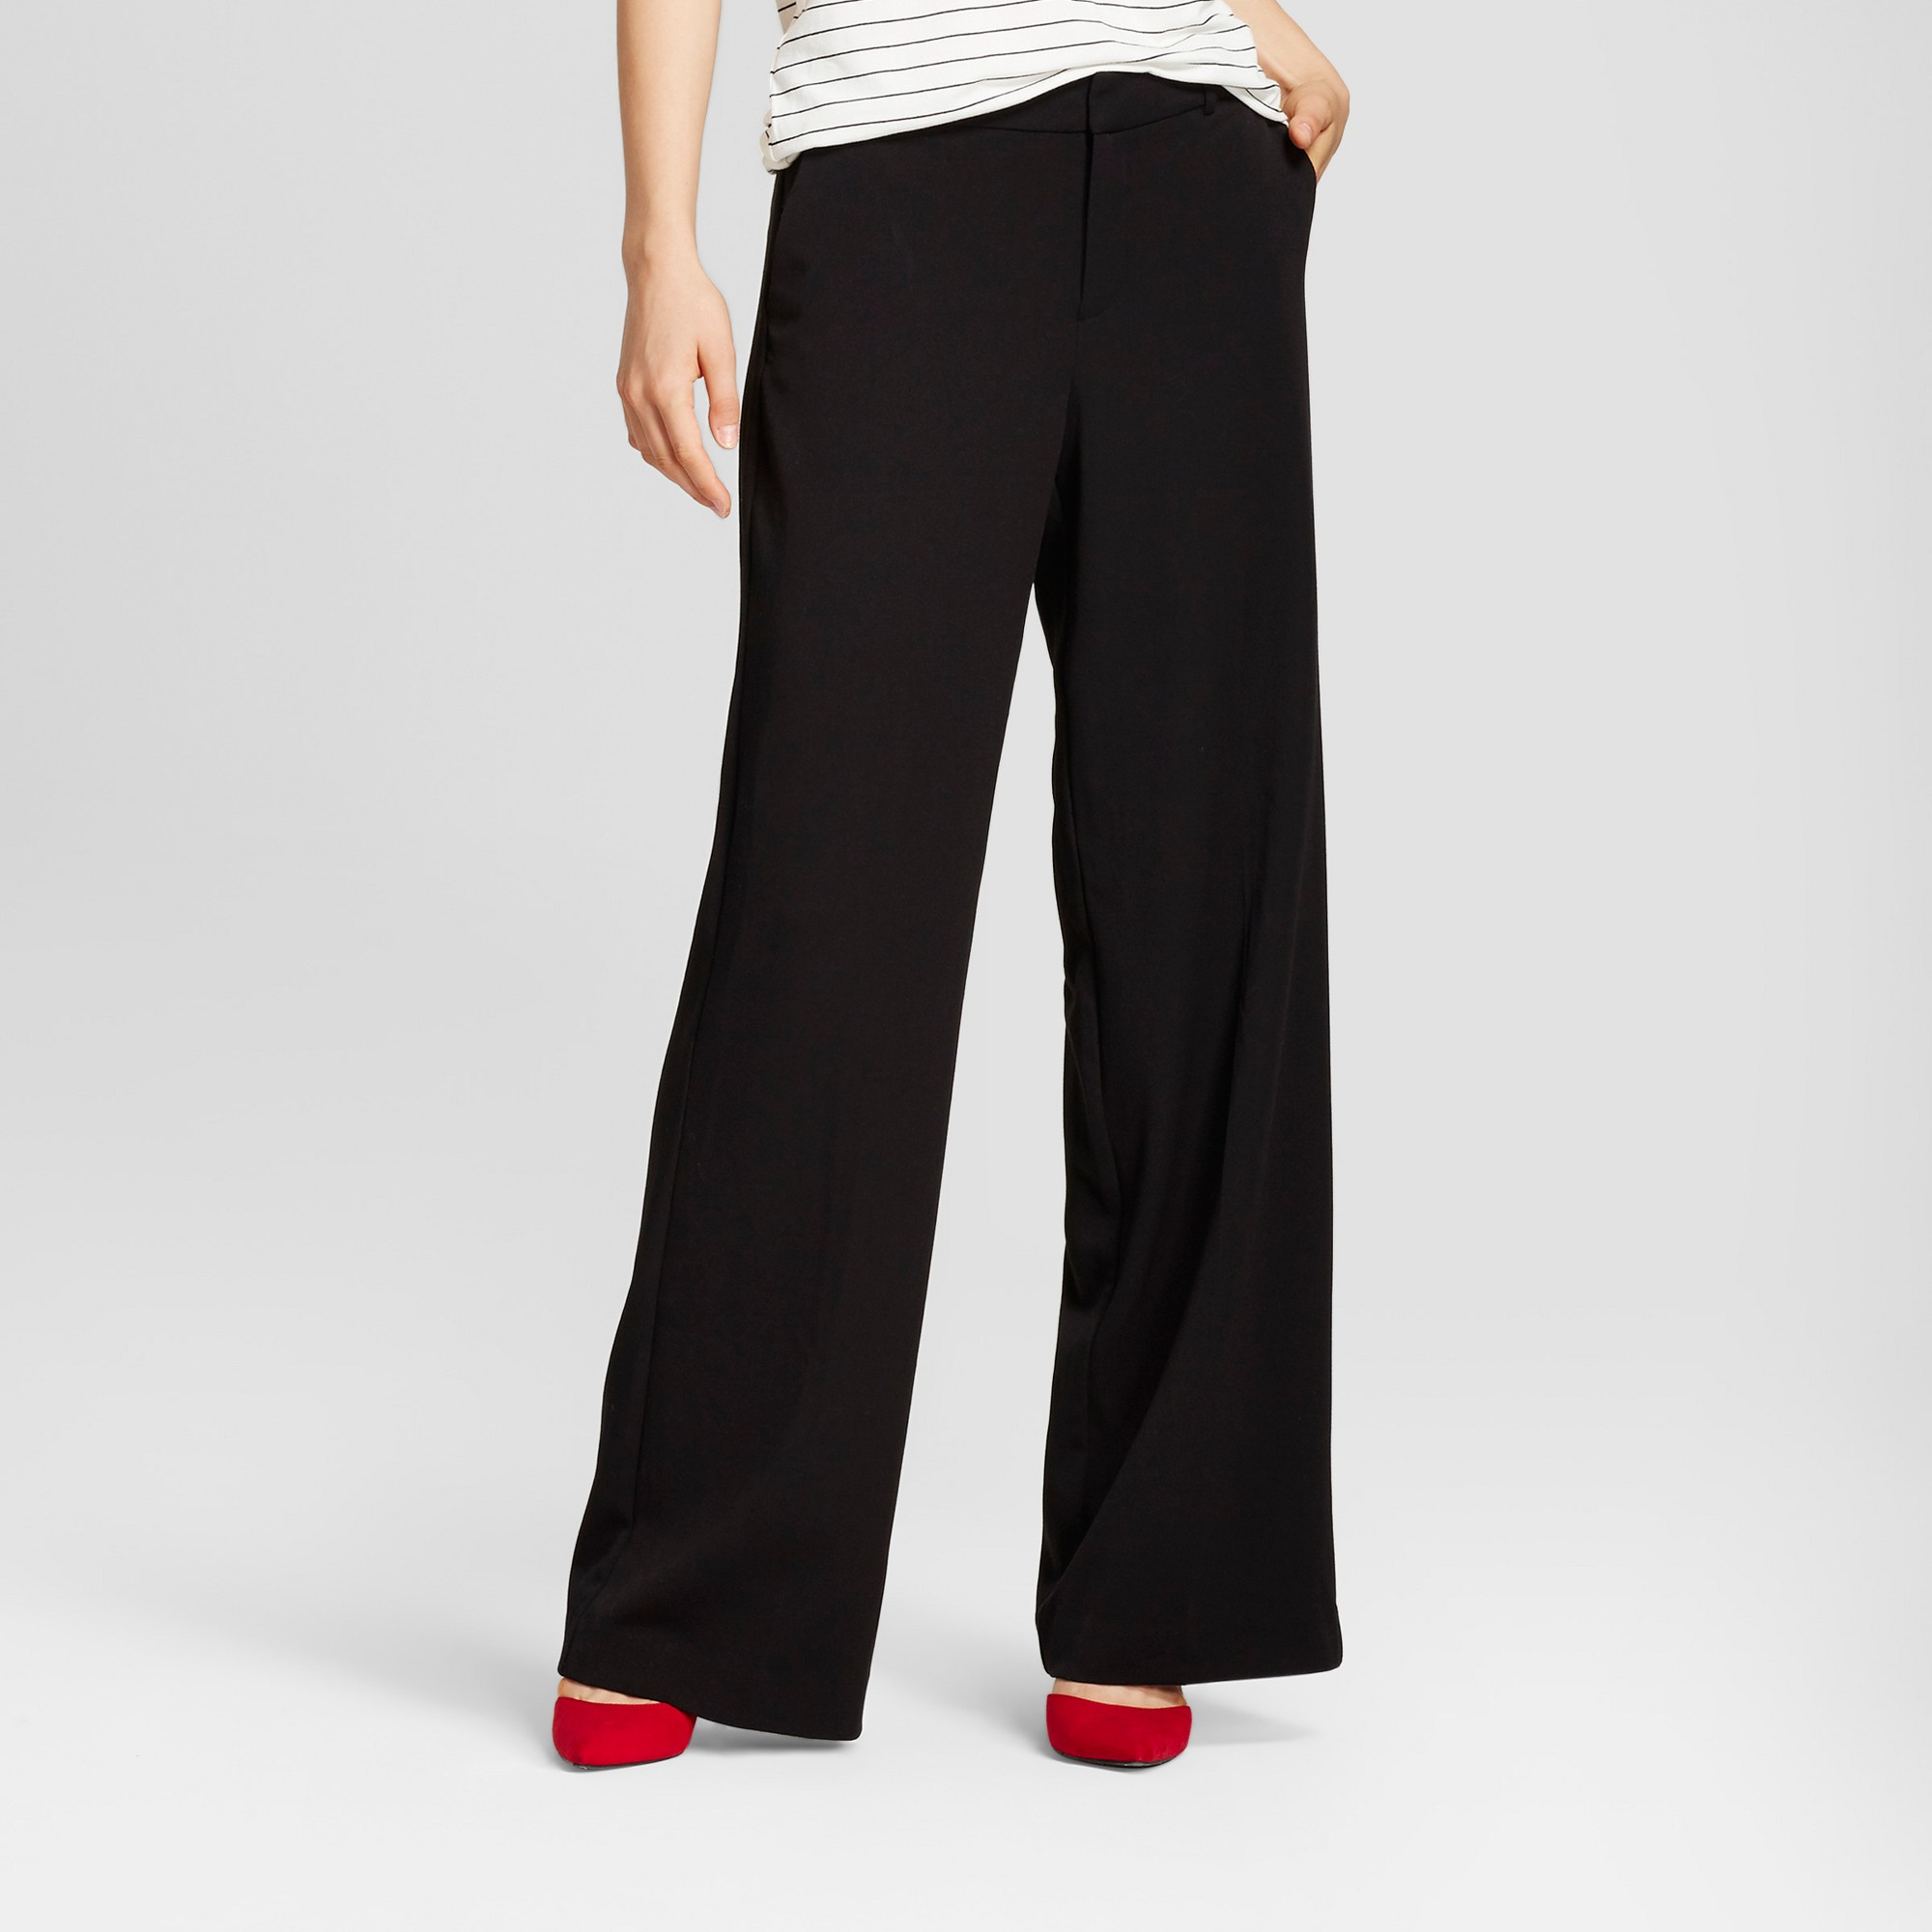 Women's Black Twill Pants